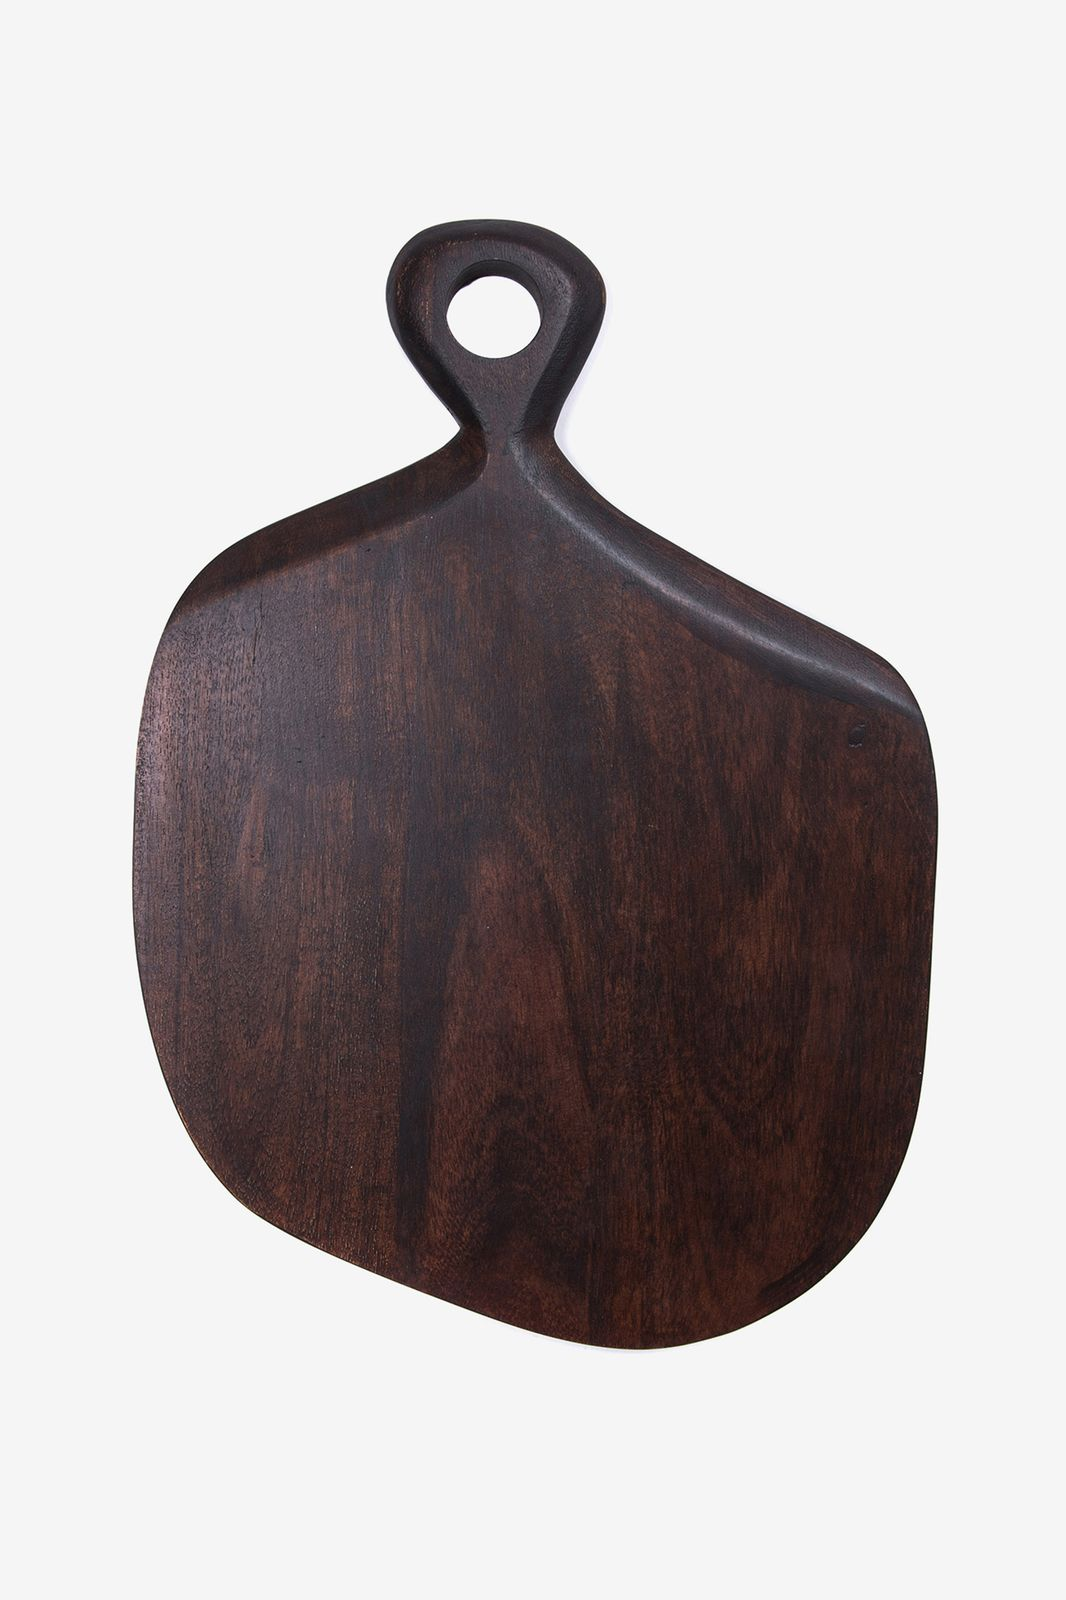 Donkerbruine serveerplank acacia hout